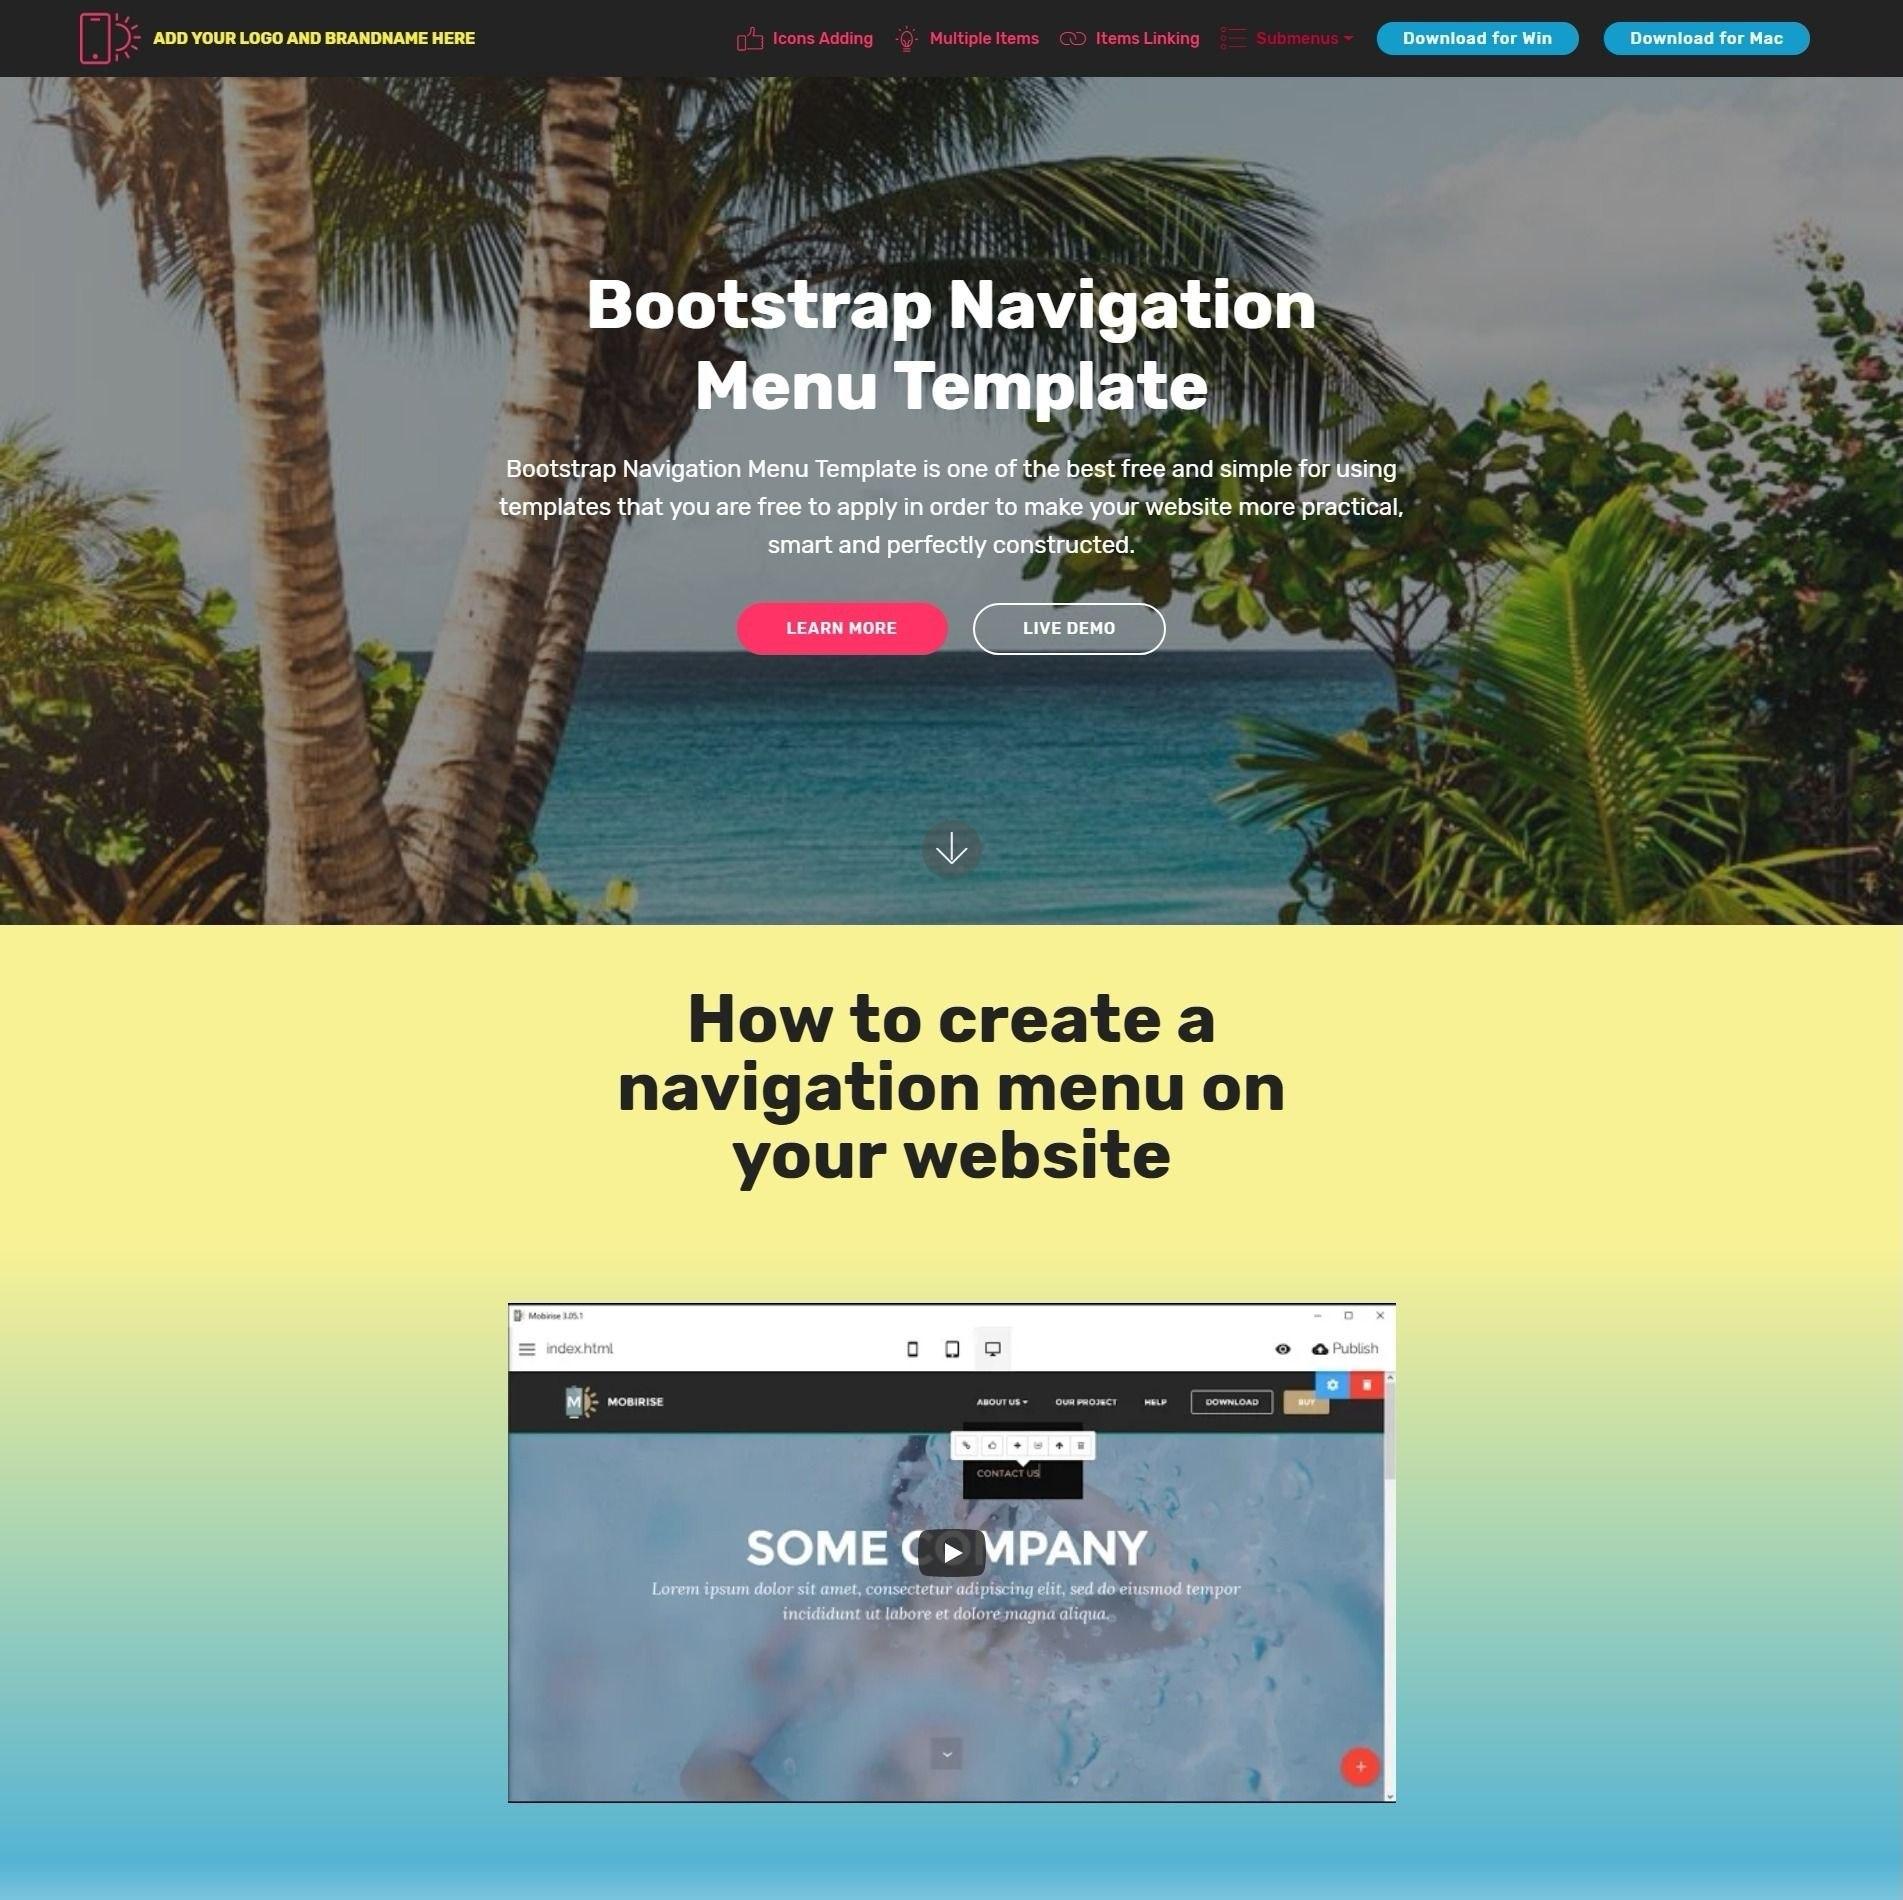 Bootstrap Navigation Menu Template For Html Drop Down Menu Templates Free Download